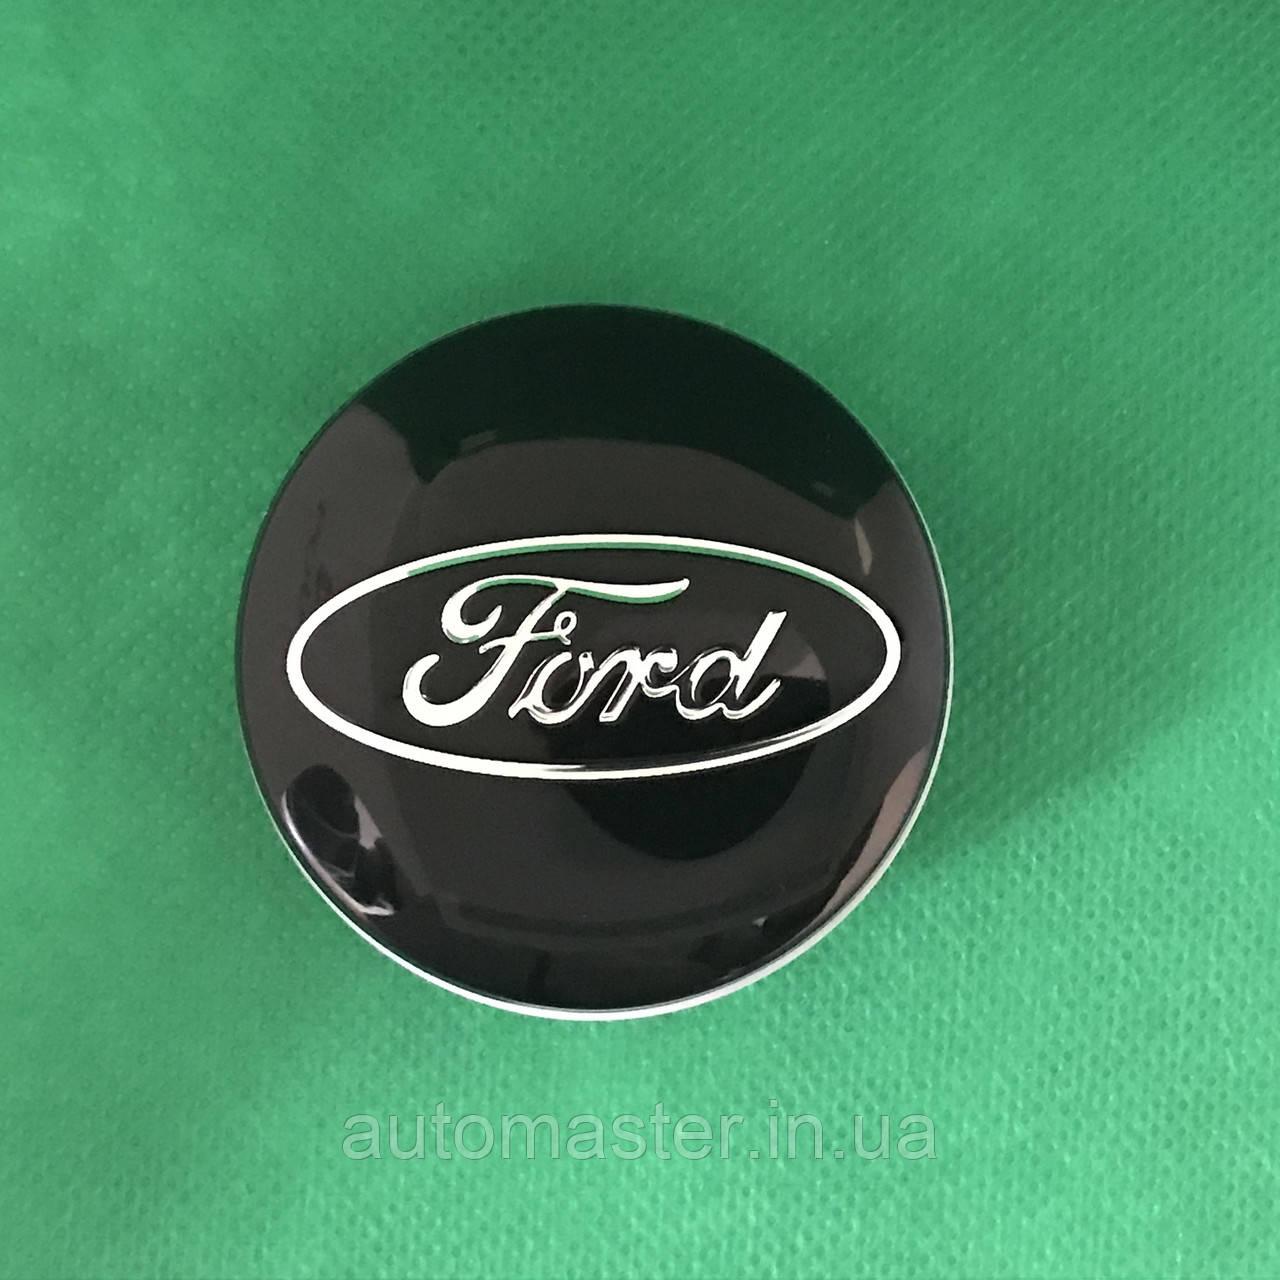 Колпачки заглушки на литые диски Ford Mondeo, Kuga, Escort 54/50/9, 6M21-1003-AA, черные